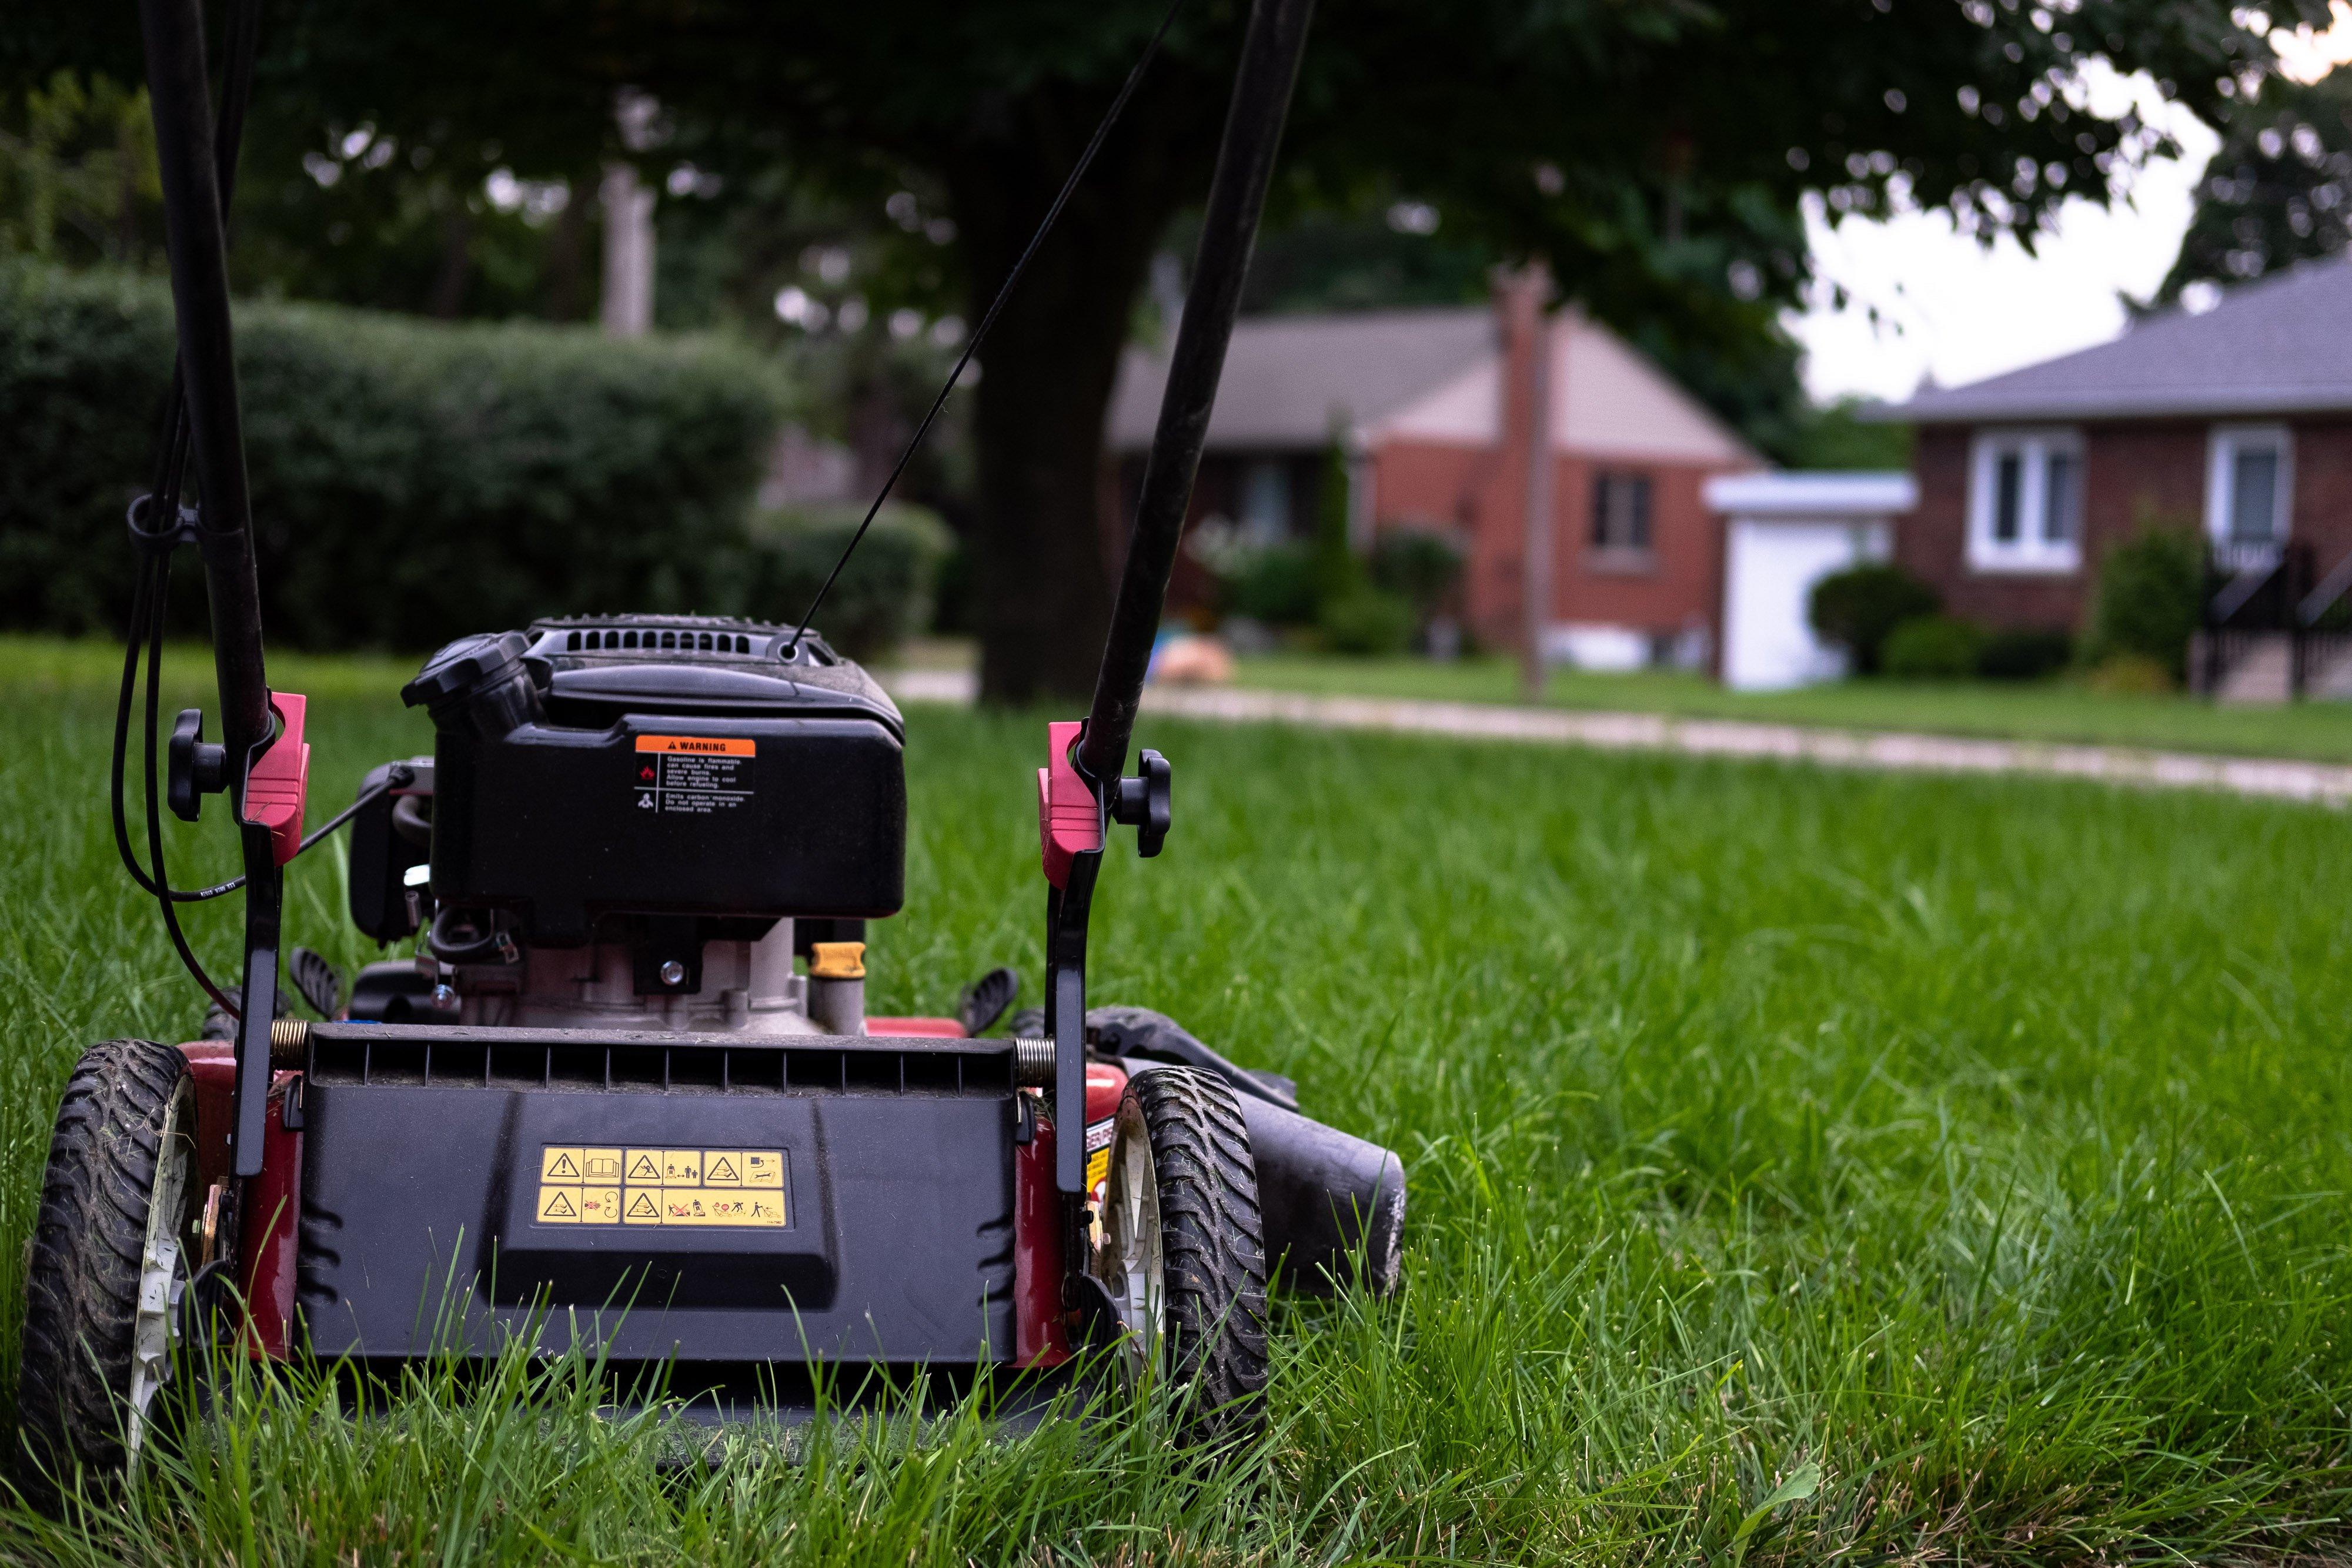 Cvr.Eastvale.lawn-mower-sitting-on-grass_4460x4460